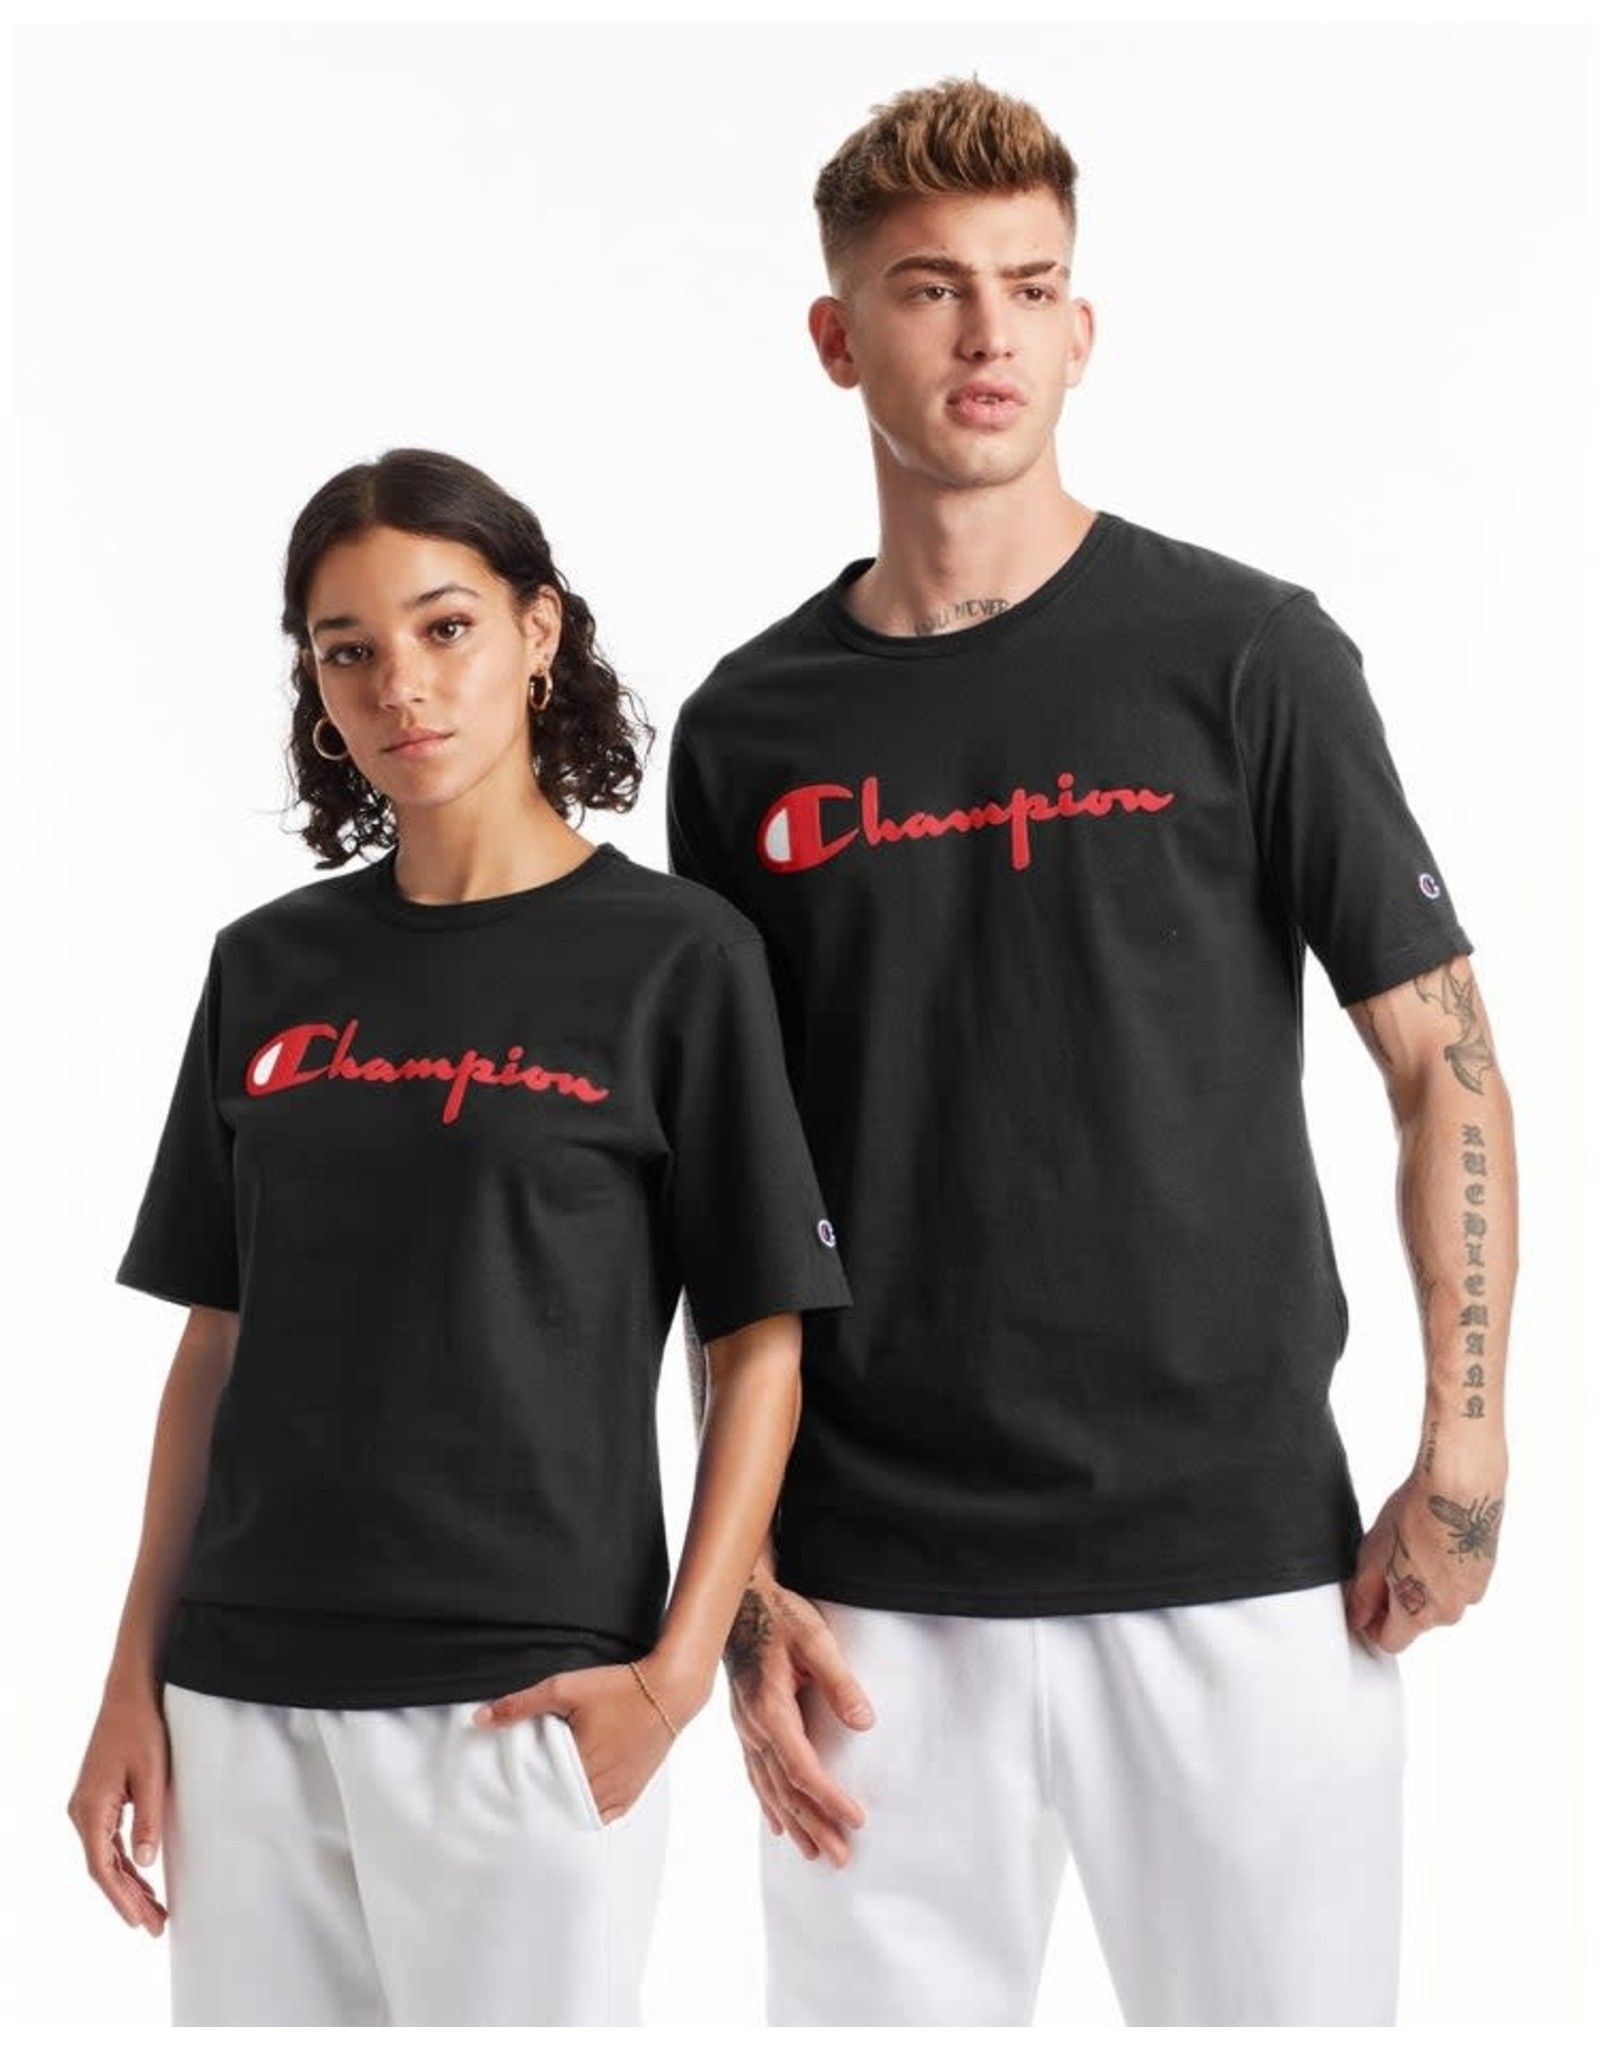 champion Champion - T-shirt homme gt19 black